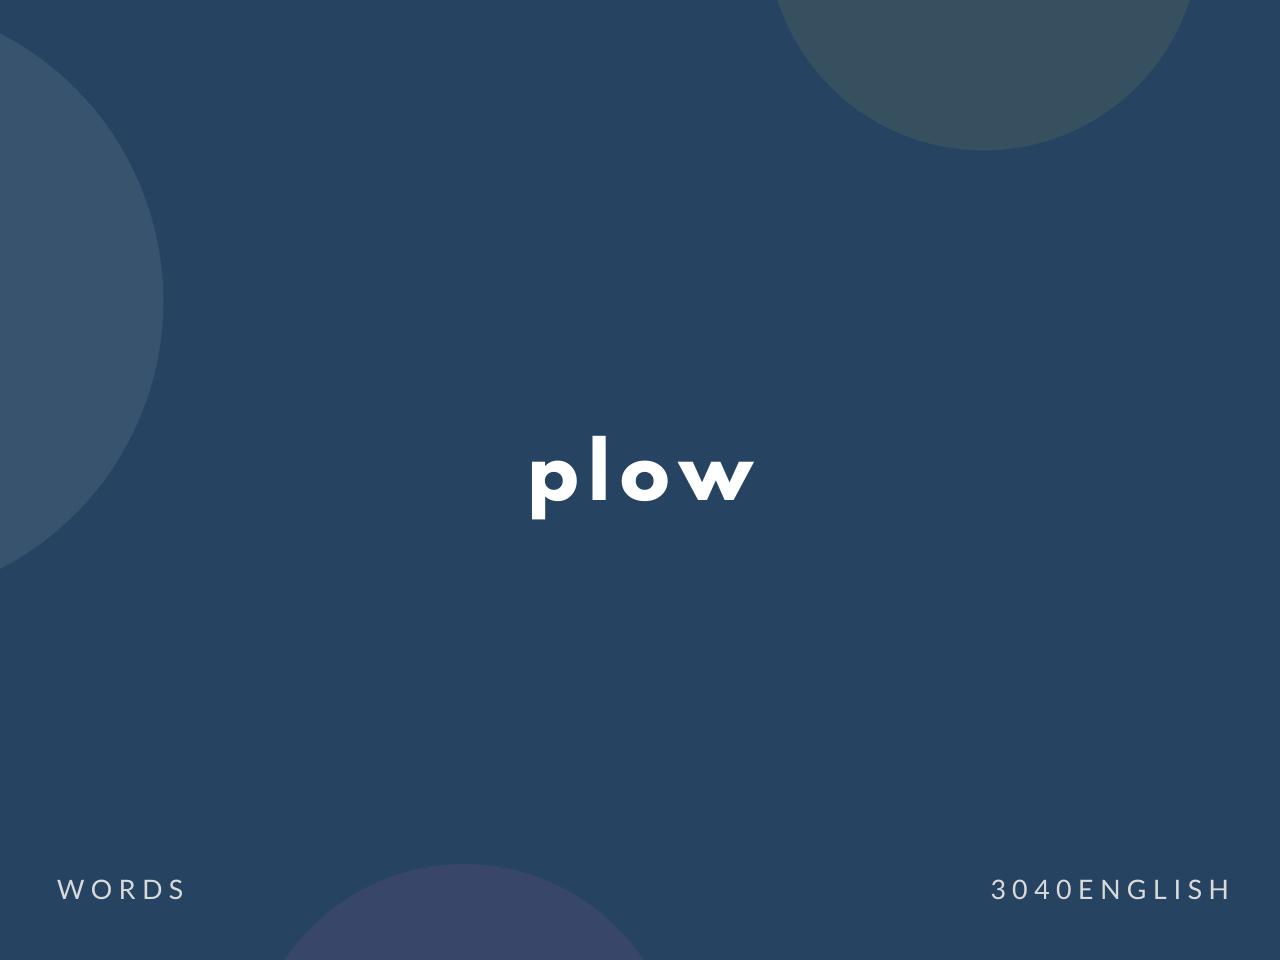 plow の意味と簡単な使い方【音読用例文あり】